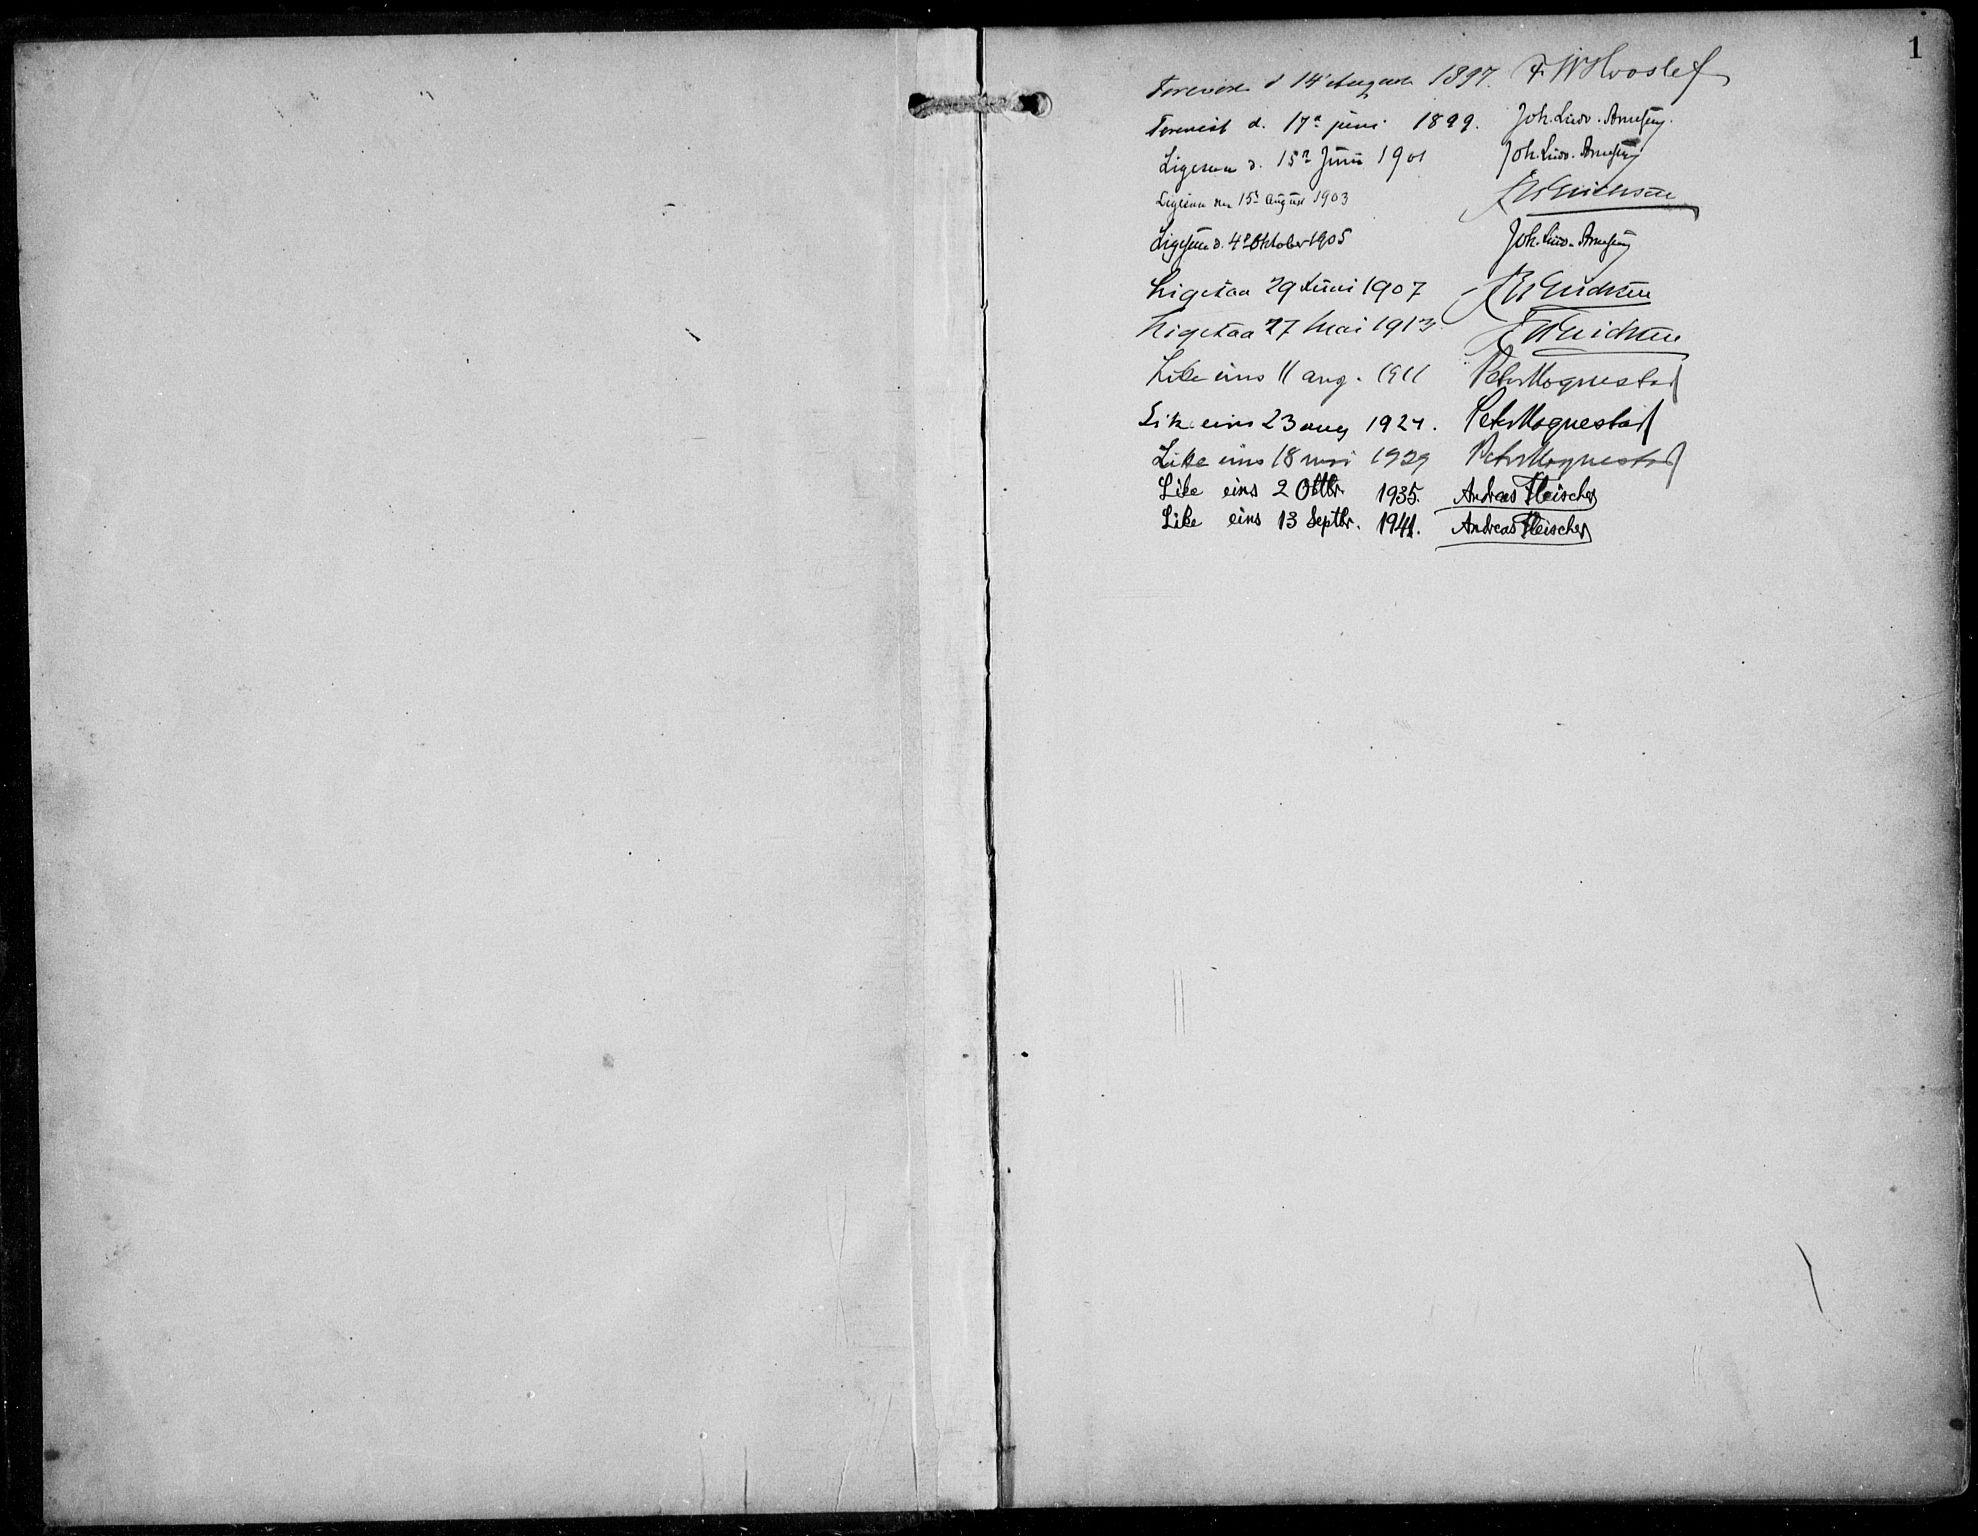 SAB, Aurland Sokneprestembete*, Klokkerbok nr. A 3, 1896-1939, s. 1